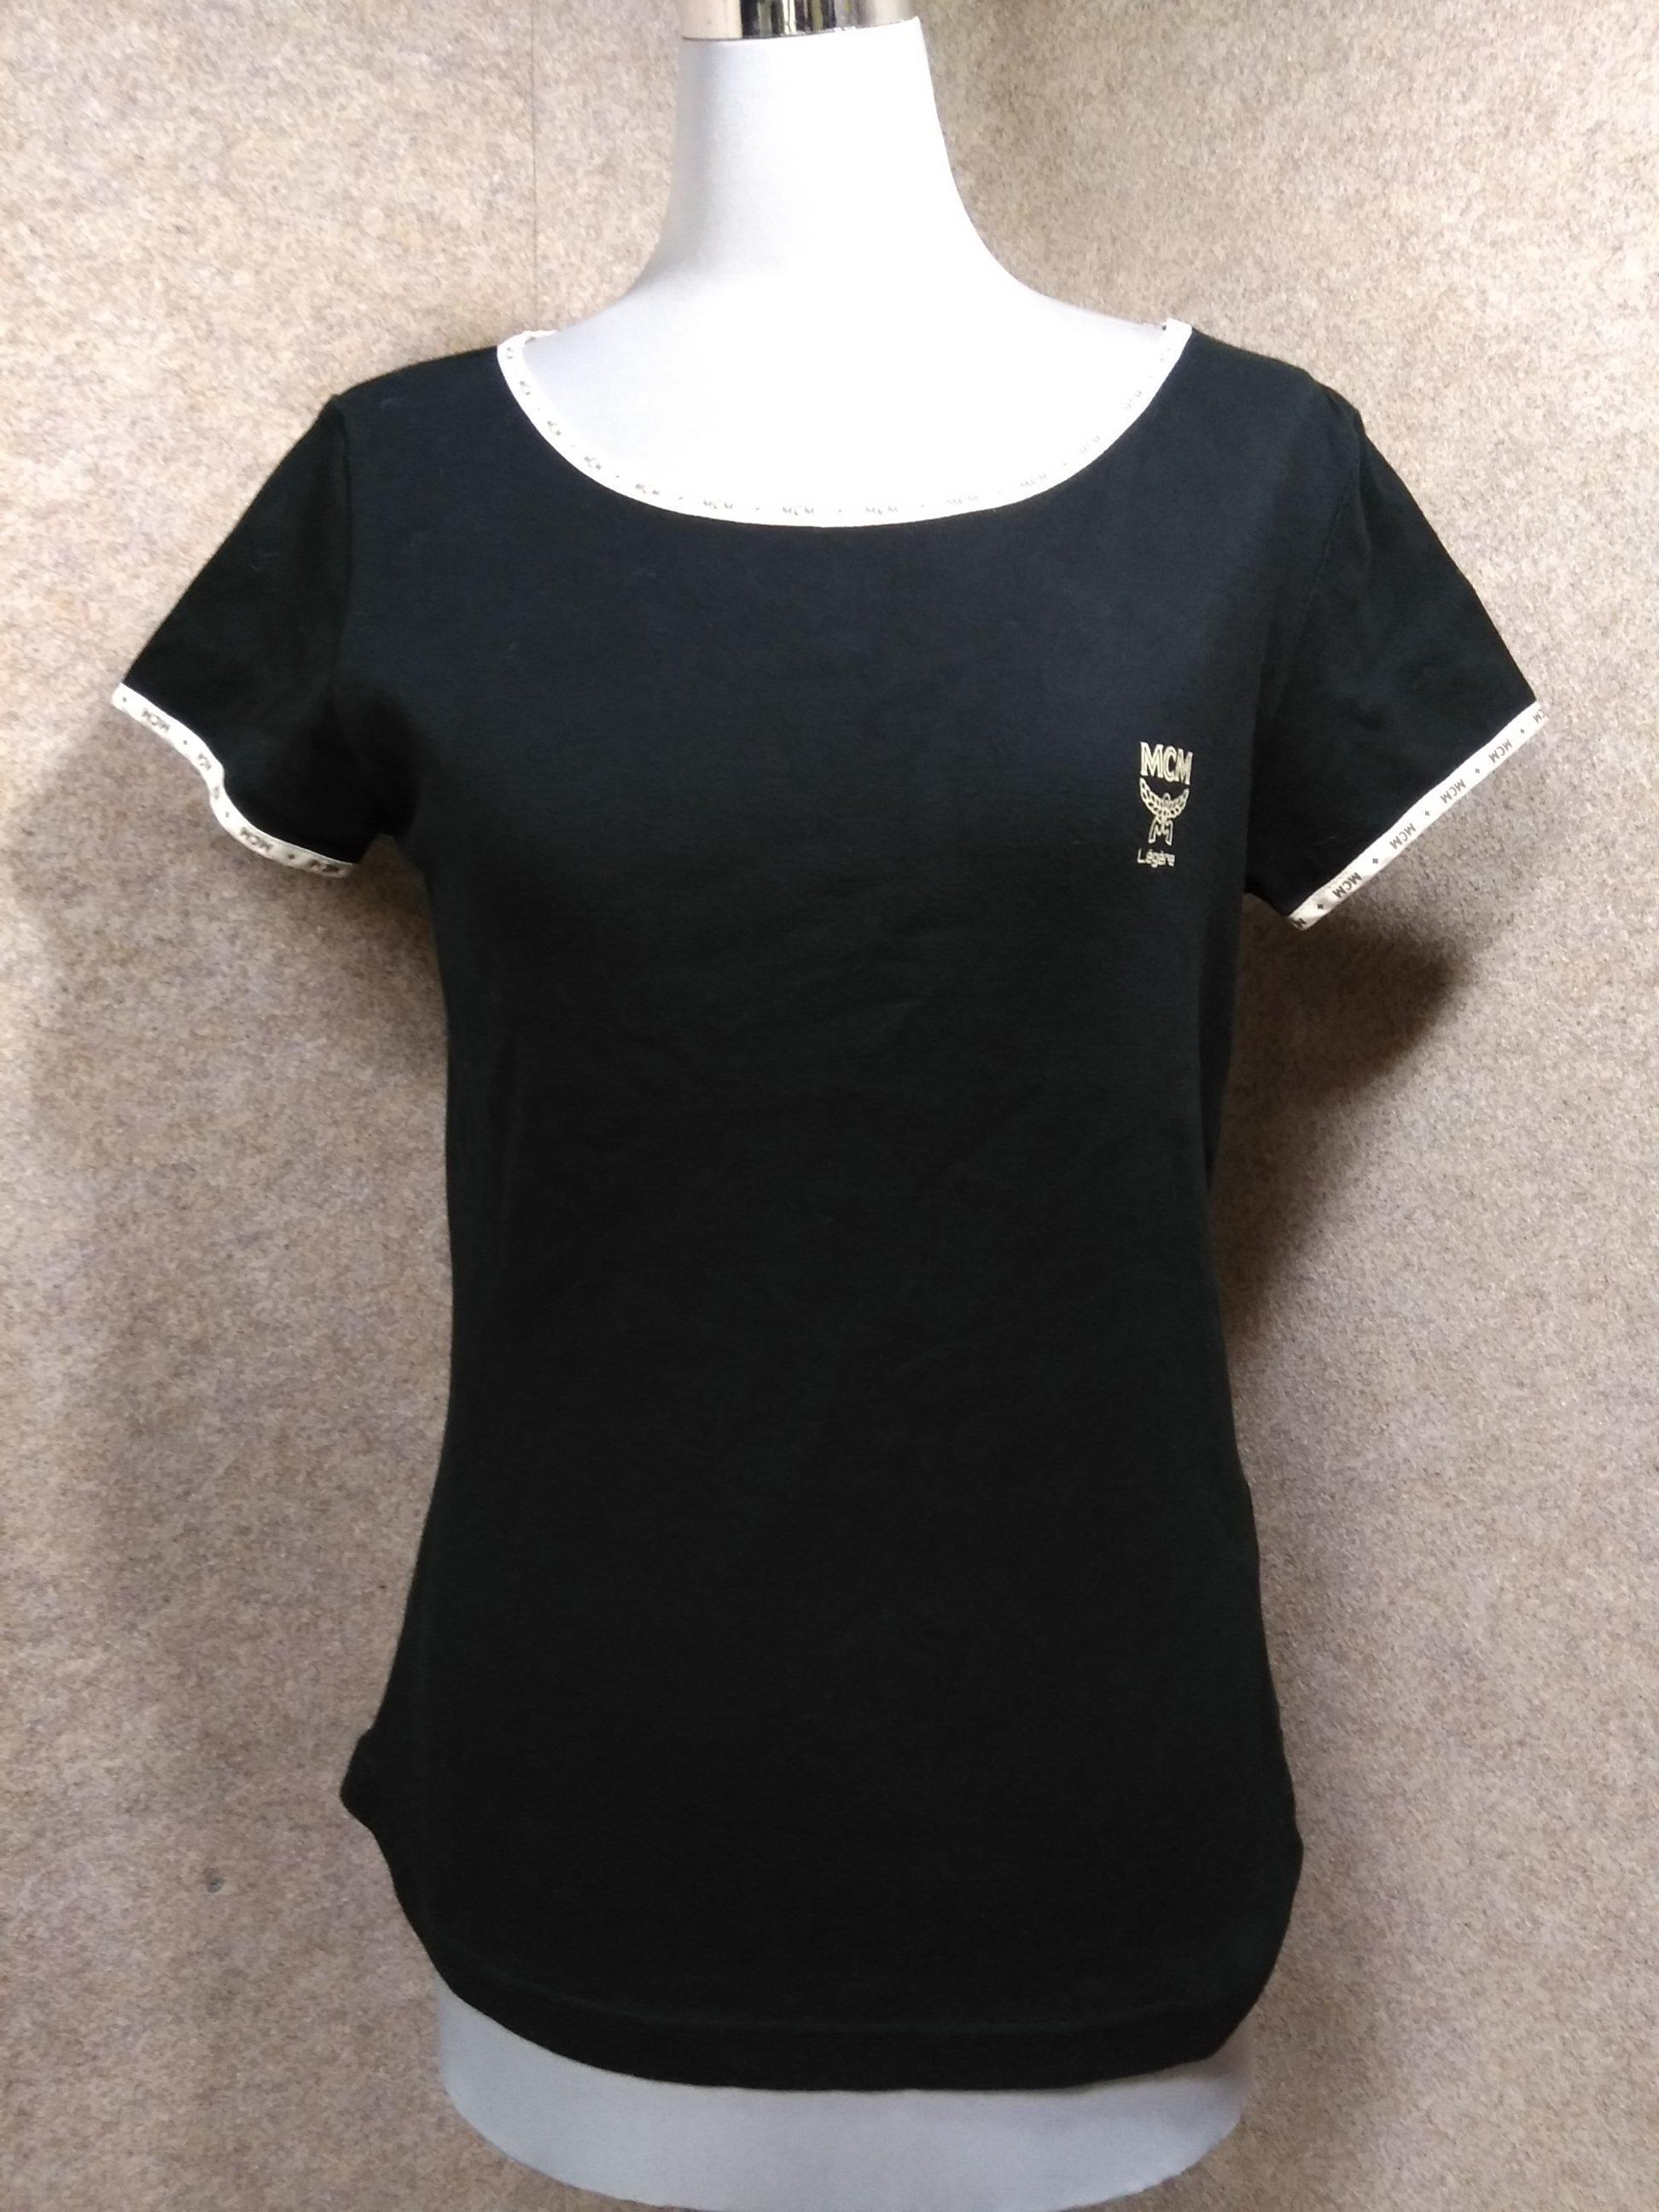 MCM エムシーエム Tシャツ M 黒 u1147a